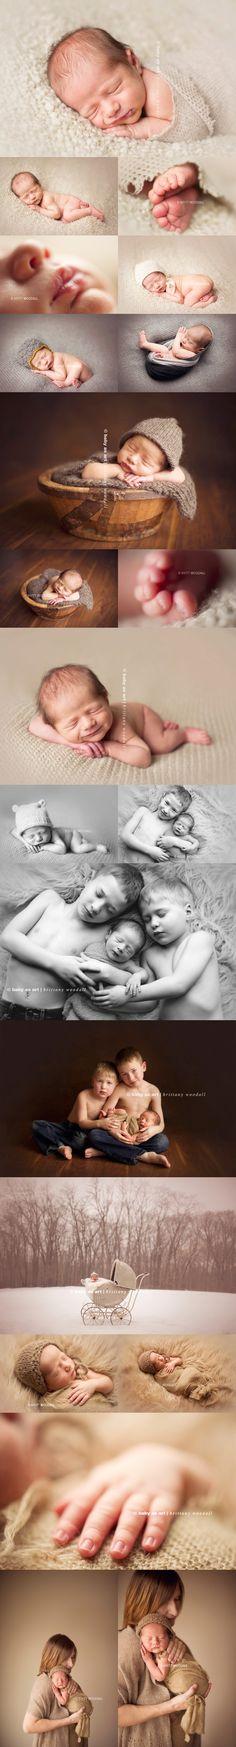 Newborn Photography- Poses.  LOVE!!!